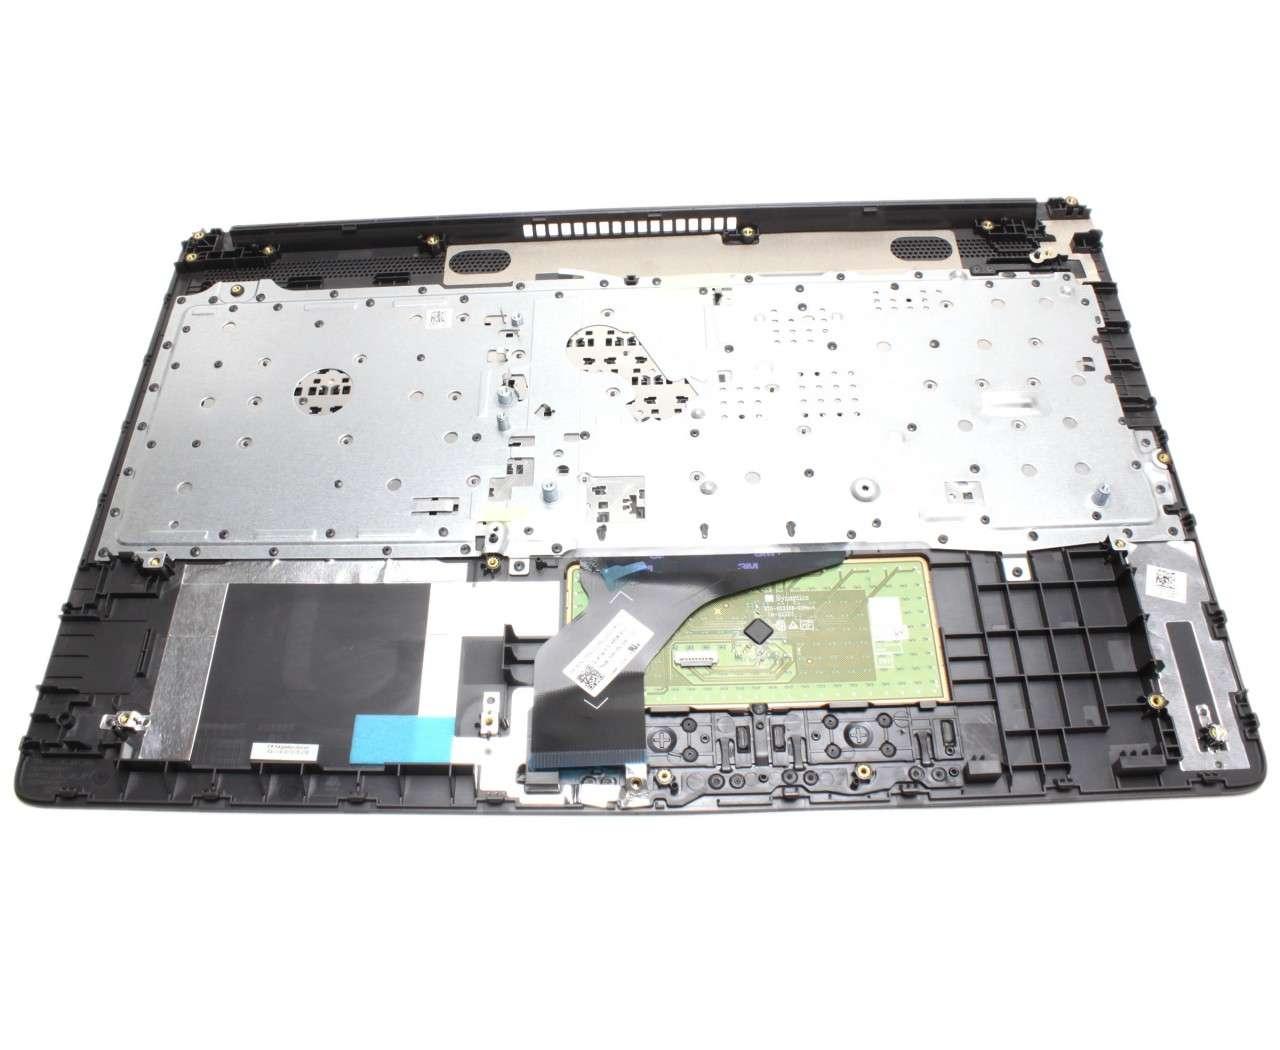 Tastatura HP FA29M000520 neagra cu Palmrest negru imagine powerlaptop.ro 2021